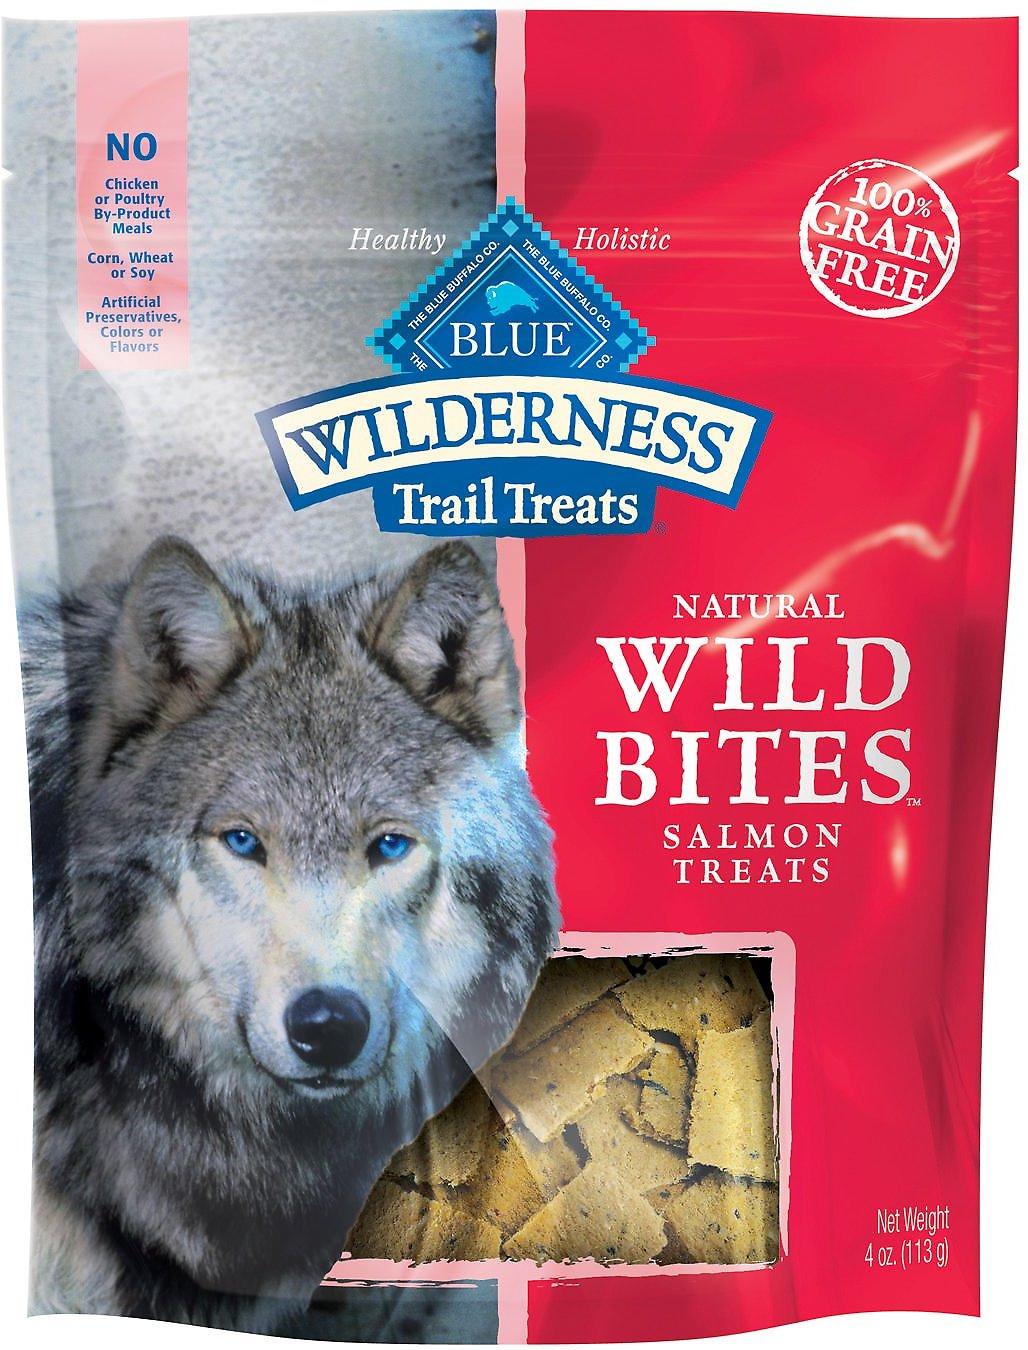 Blue Buffalo Wilderness Trail Treats Salmon Wild Bites Grain-Free Dog Treats, 4-oz bag Image